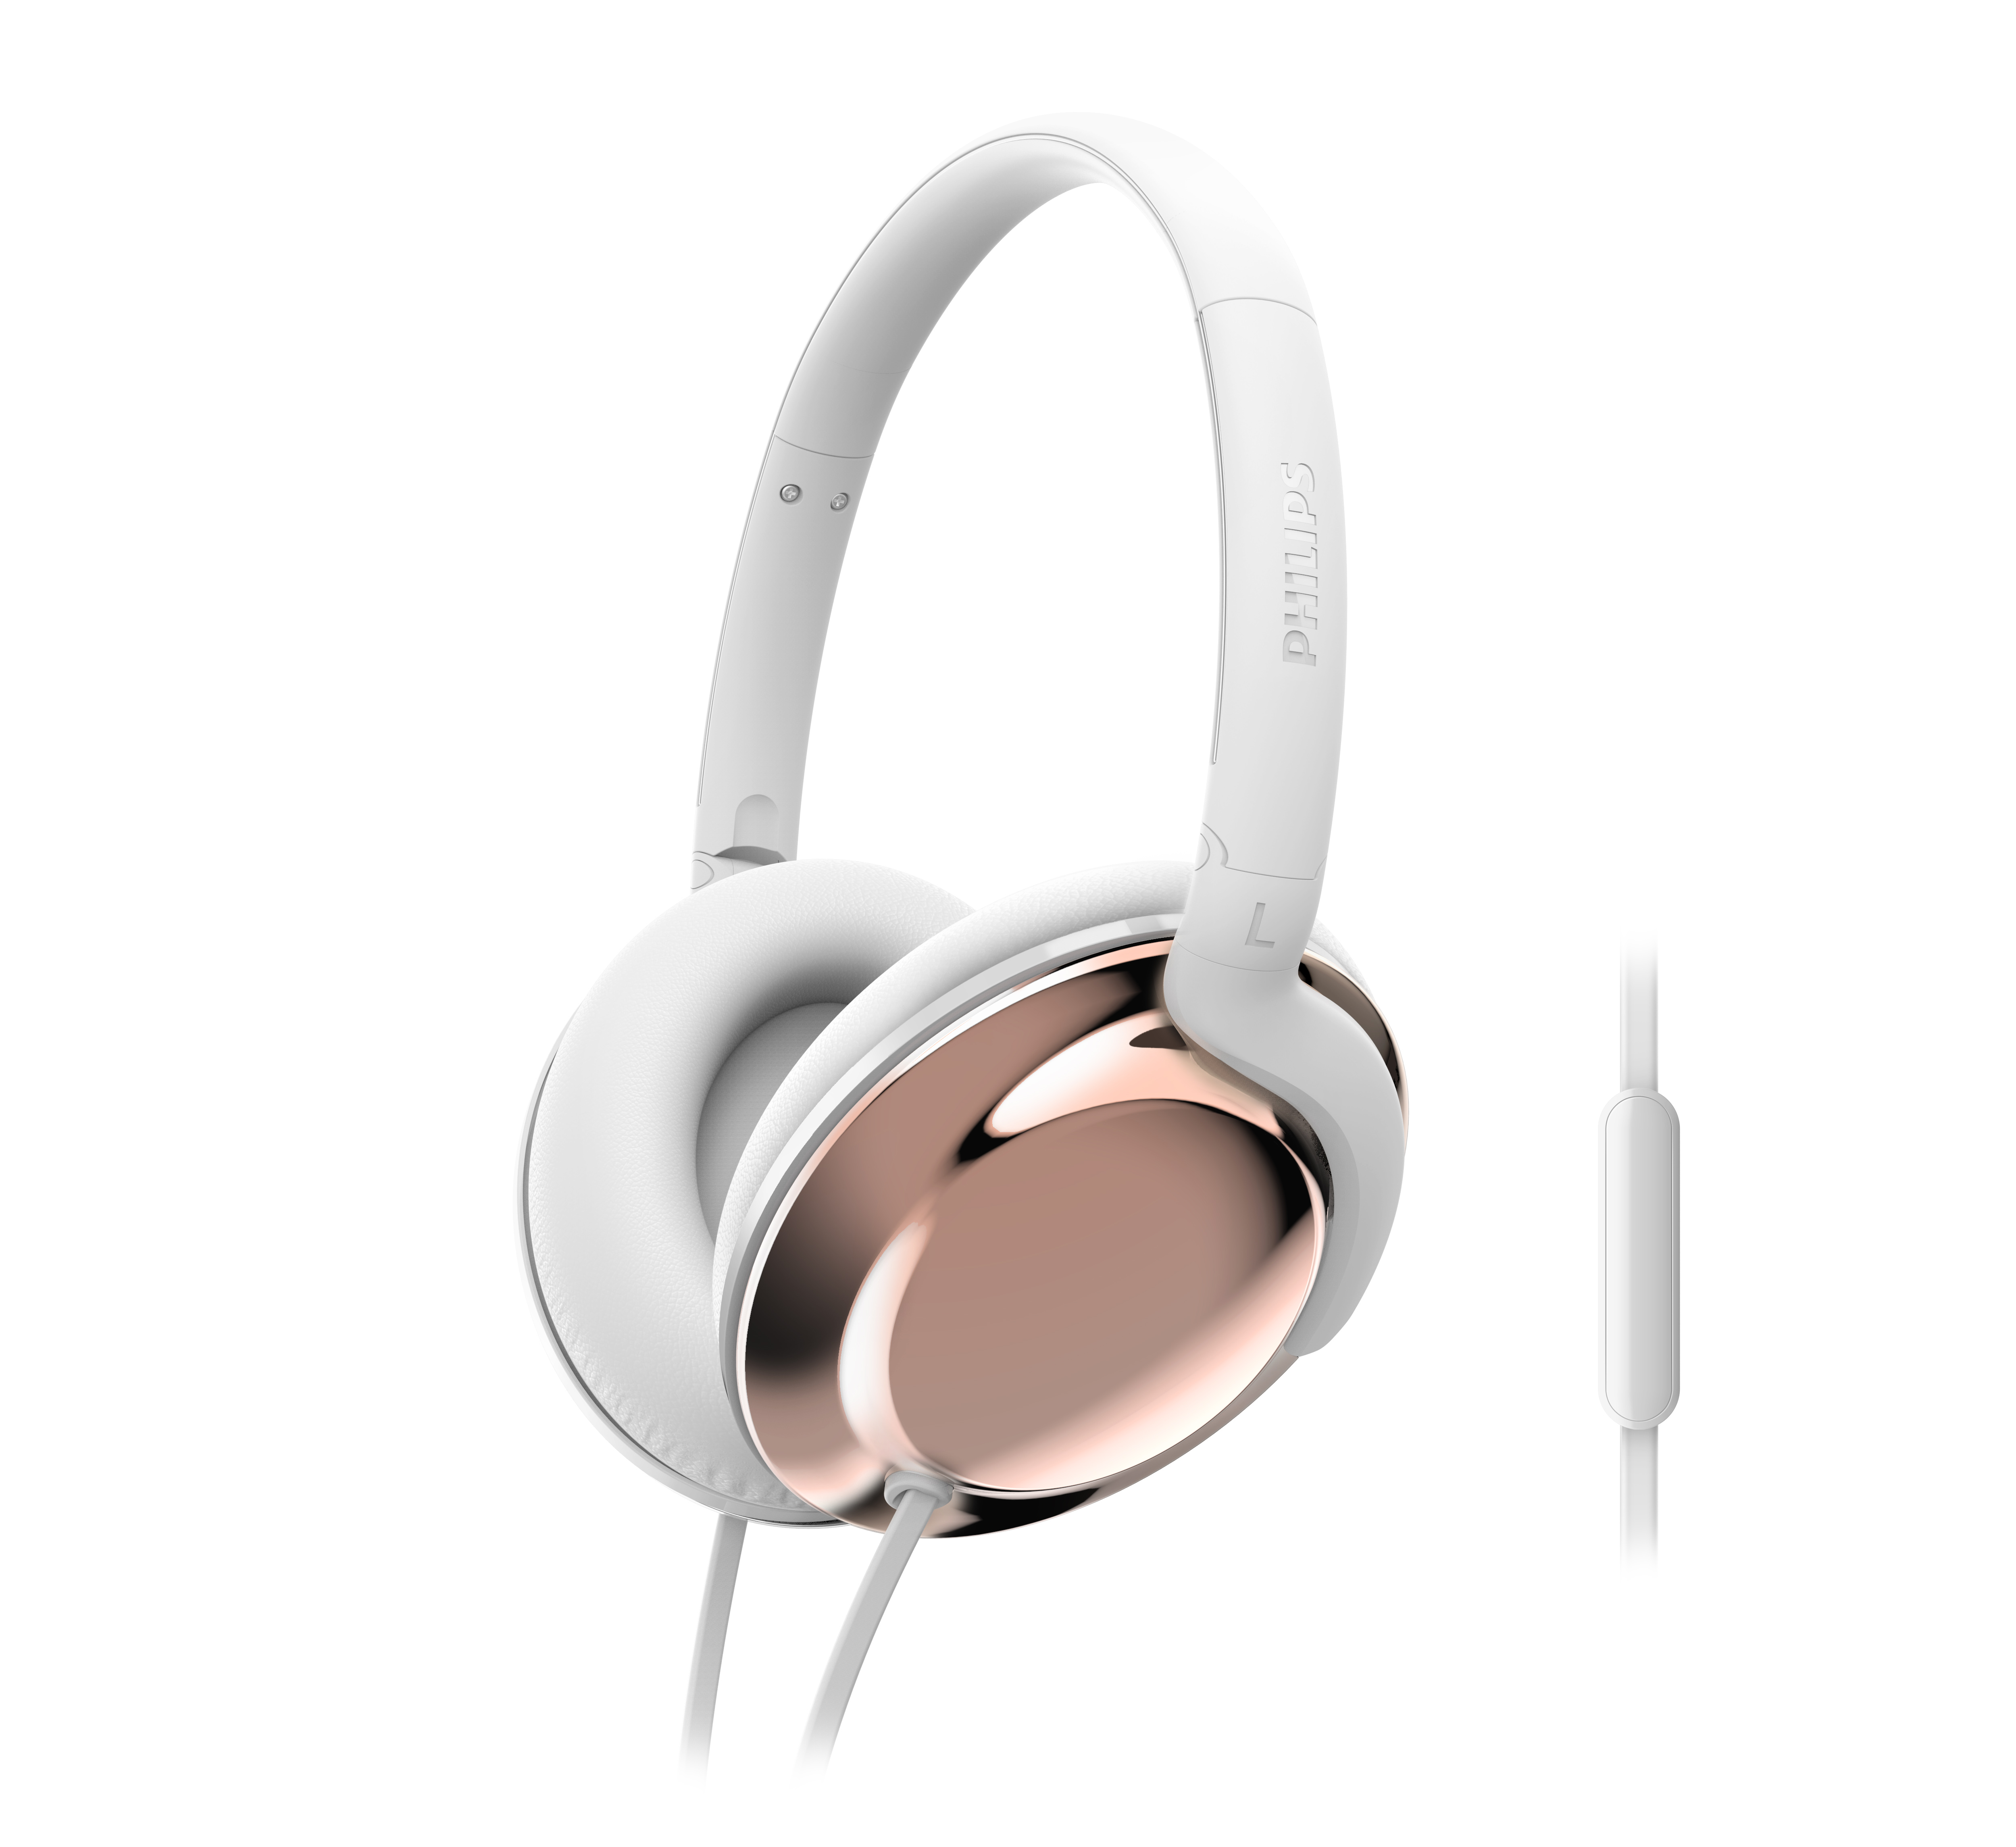 2-philips_flite_everlite_headphones_shl4805rg_image1